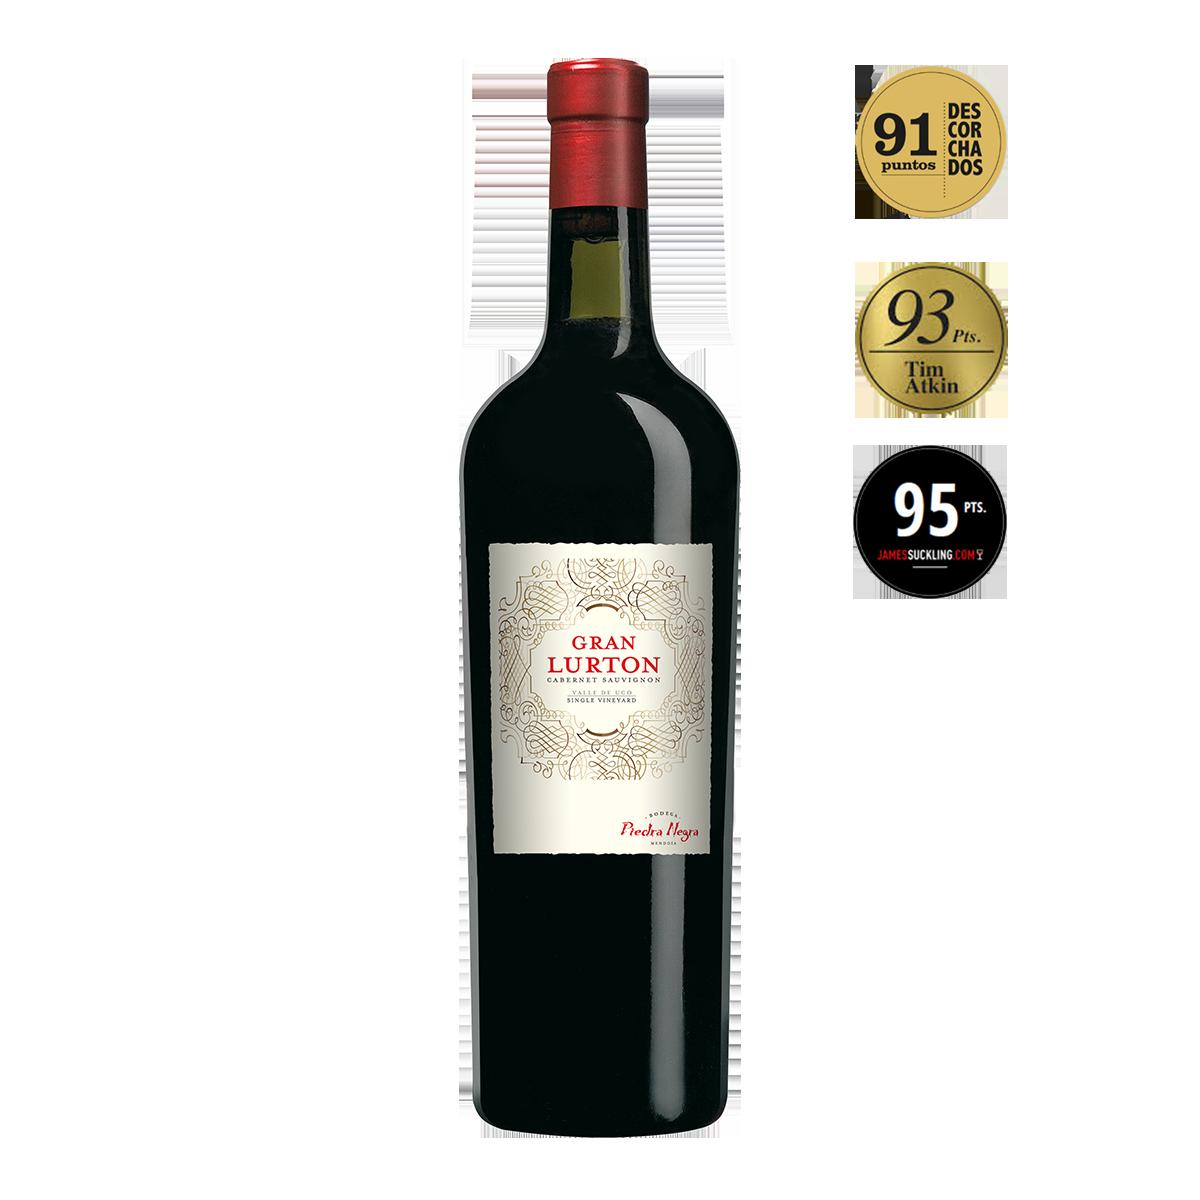 ARL1301 阿根廷門多薩魯頓黑寶石莊園大魯頓卡本內蘇維濃干紅葡萄酒 Gran Lurton Cabernet Sauvignon Gran Reserva, Valle de Uco-Mendoza